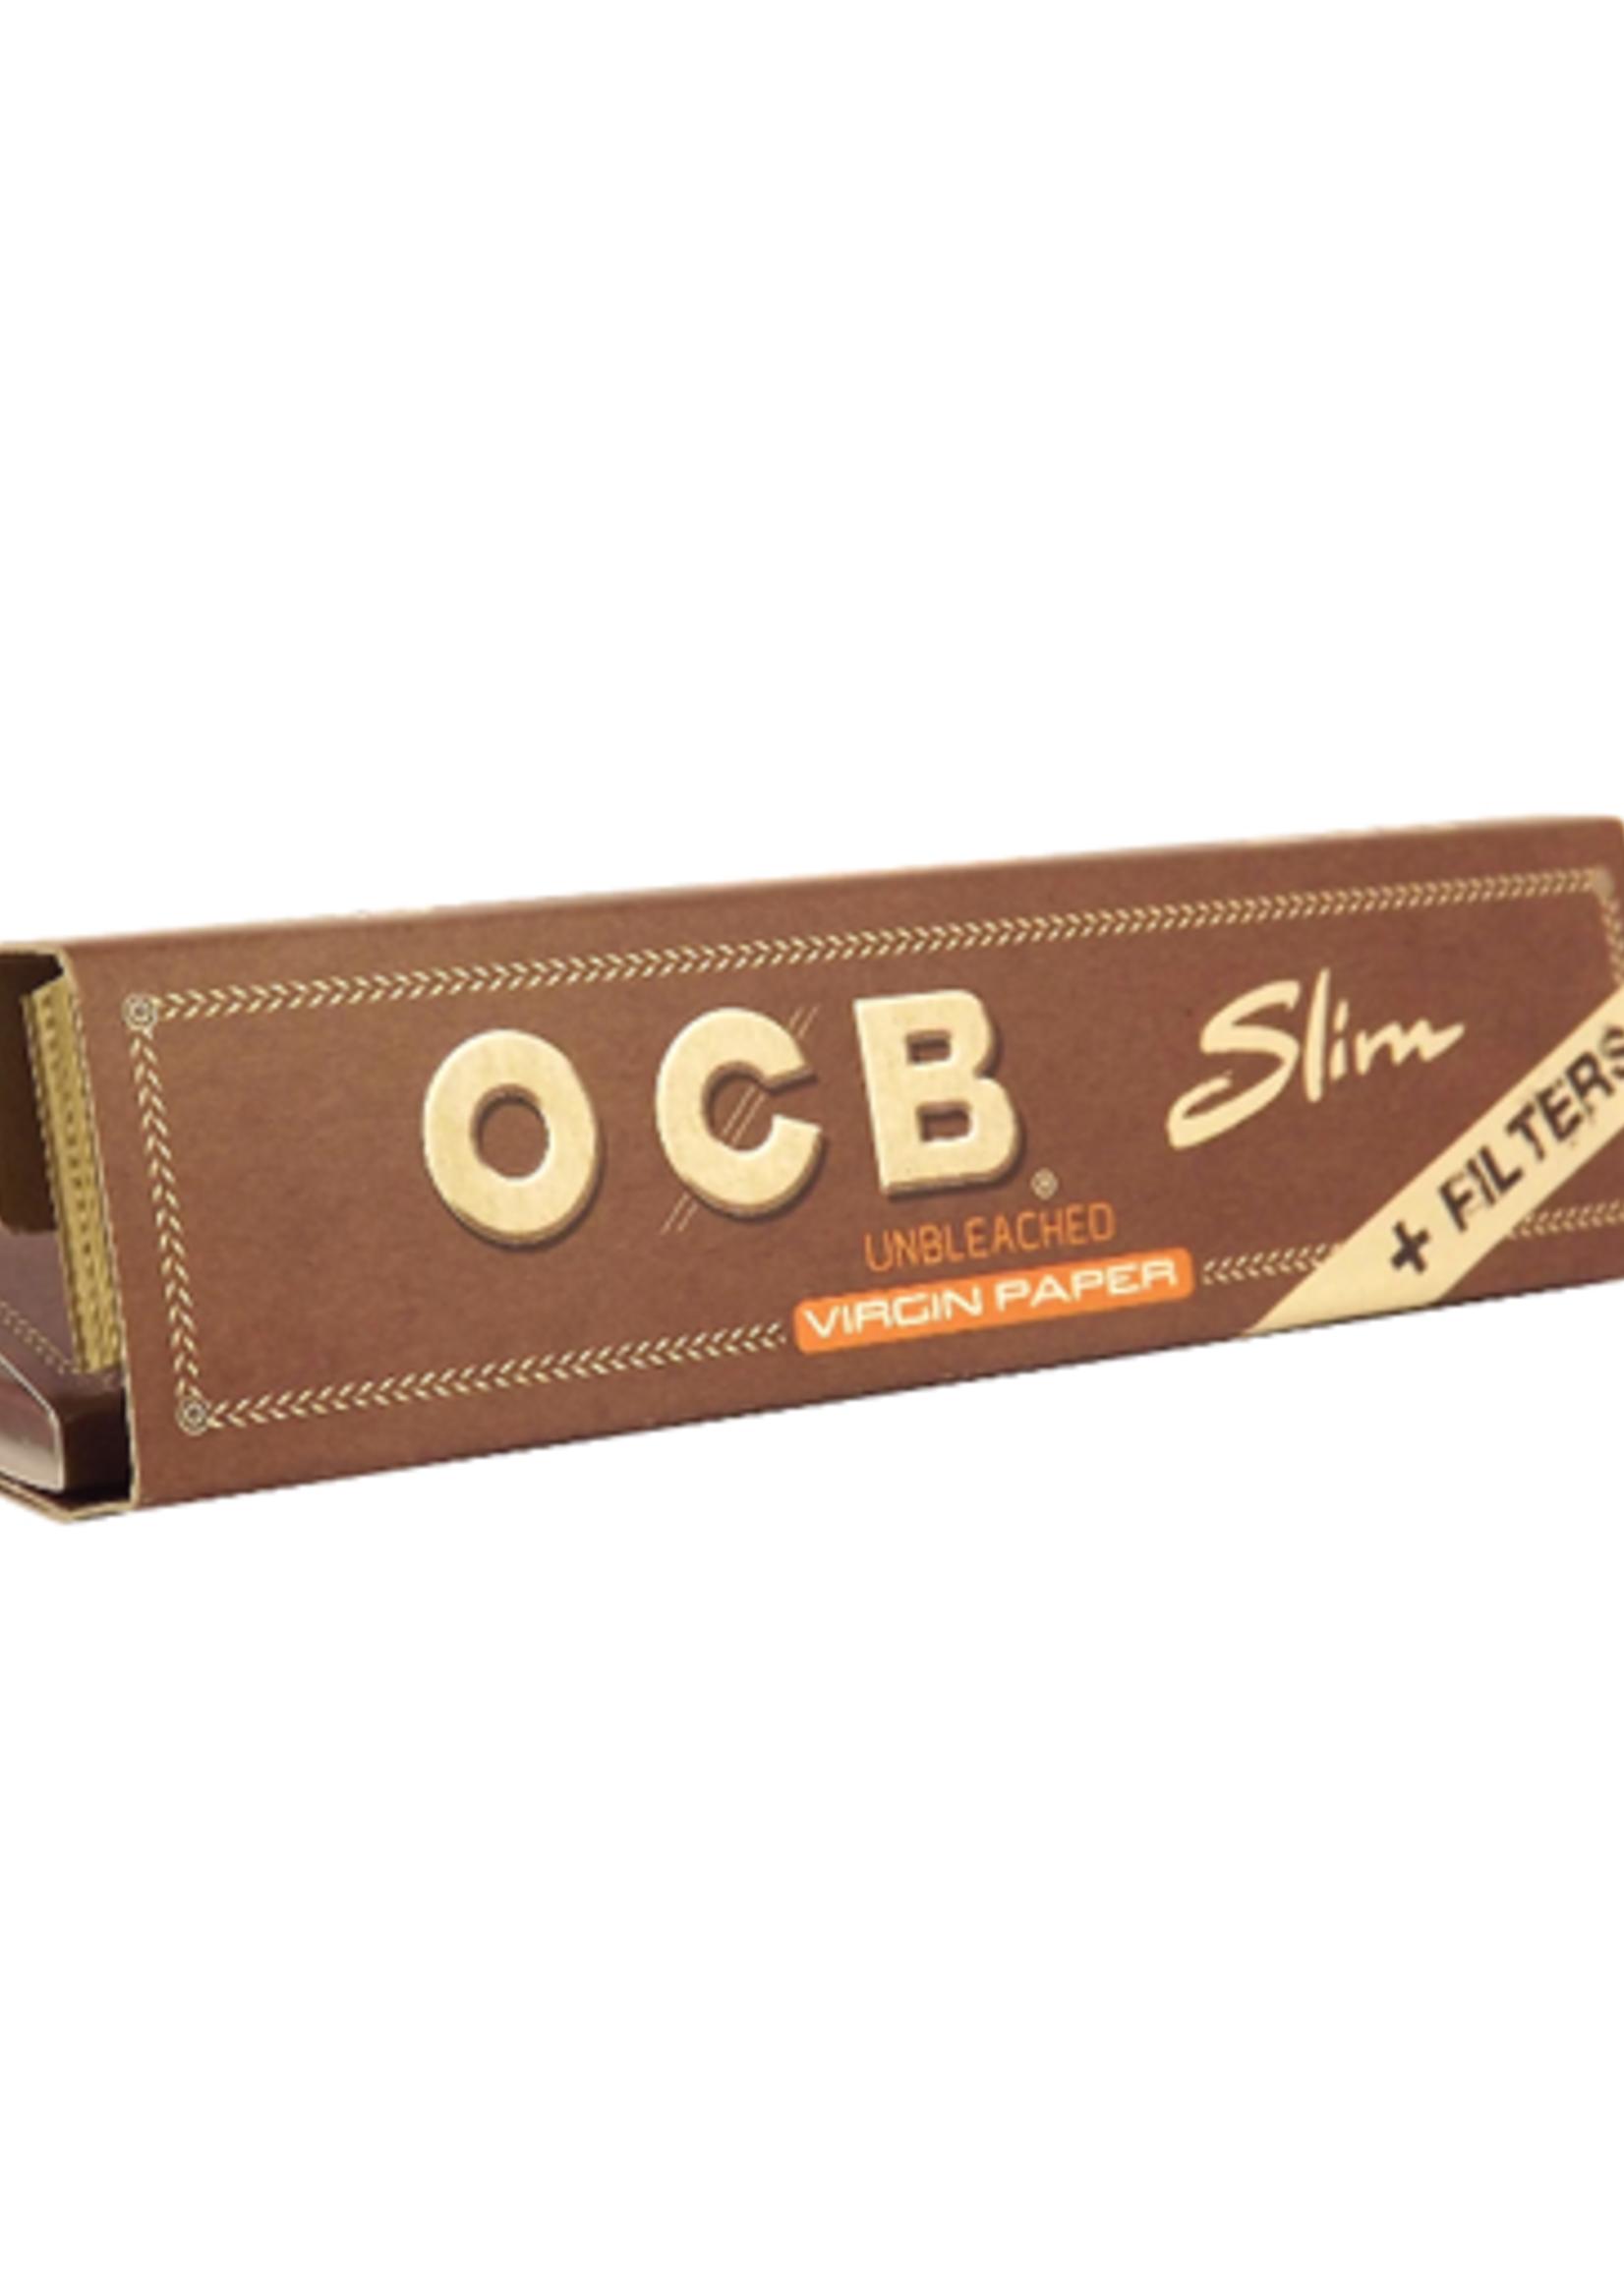 OCB - Unbleached paper & tips